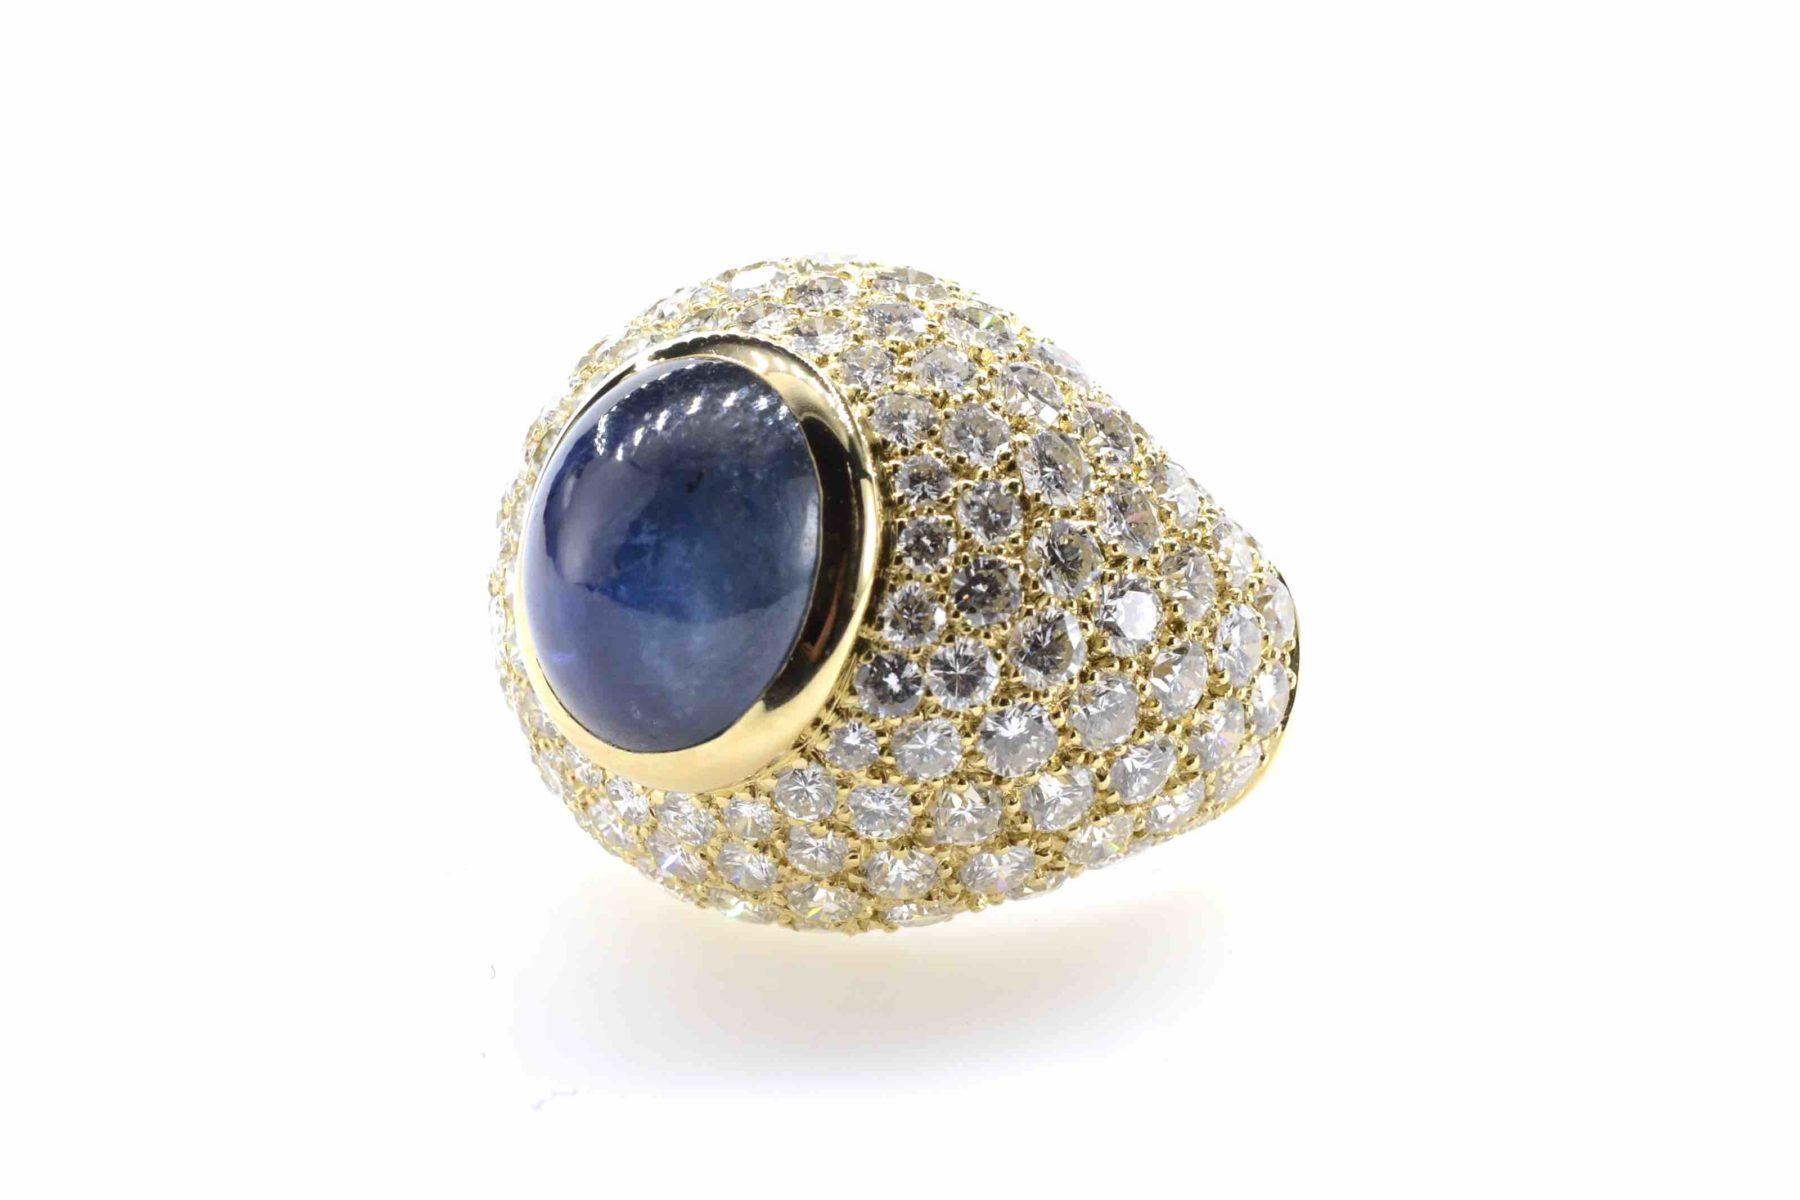 bague dôme saphir et diamants en or jaune 18k